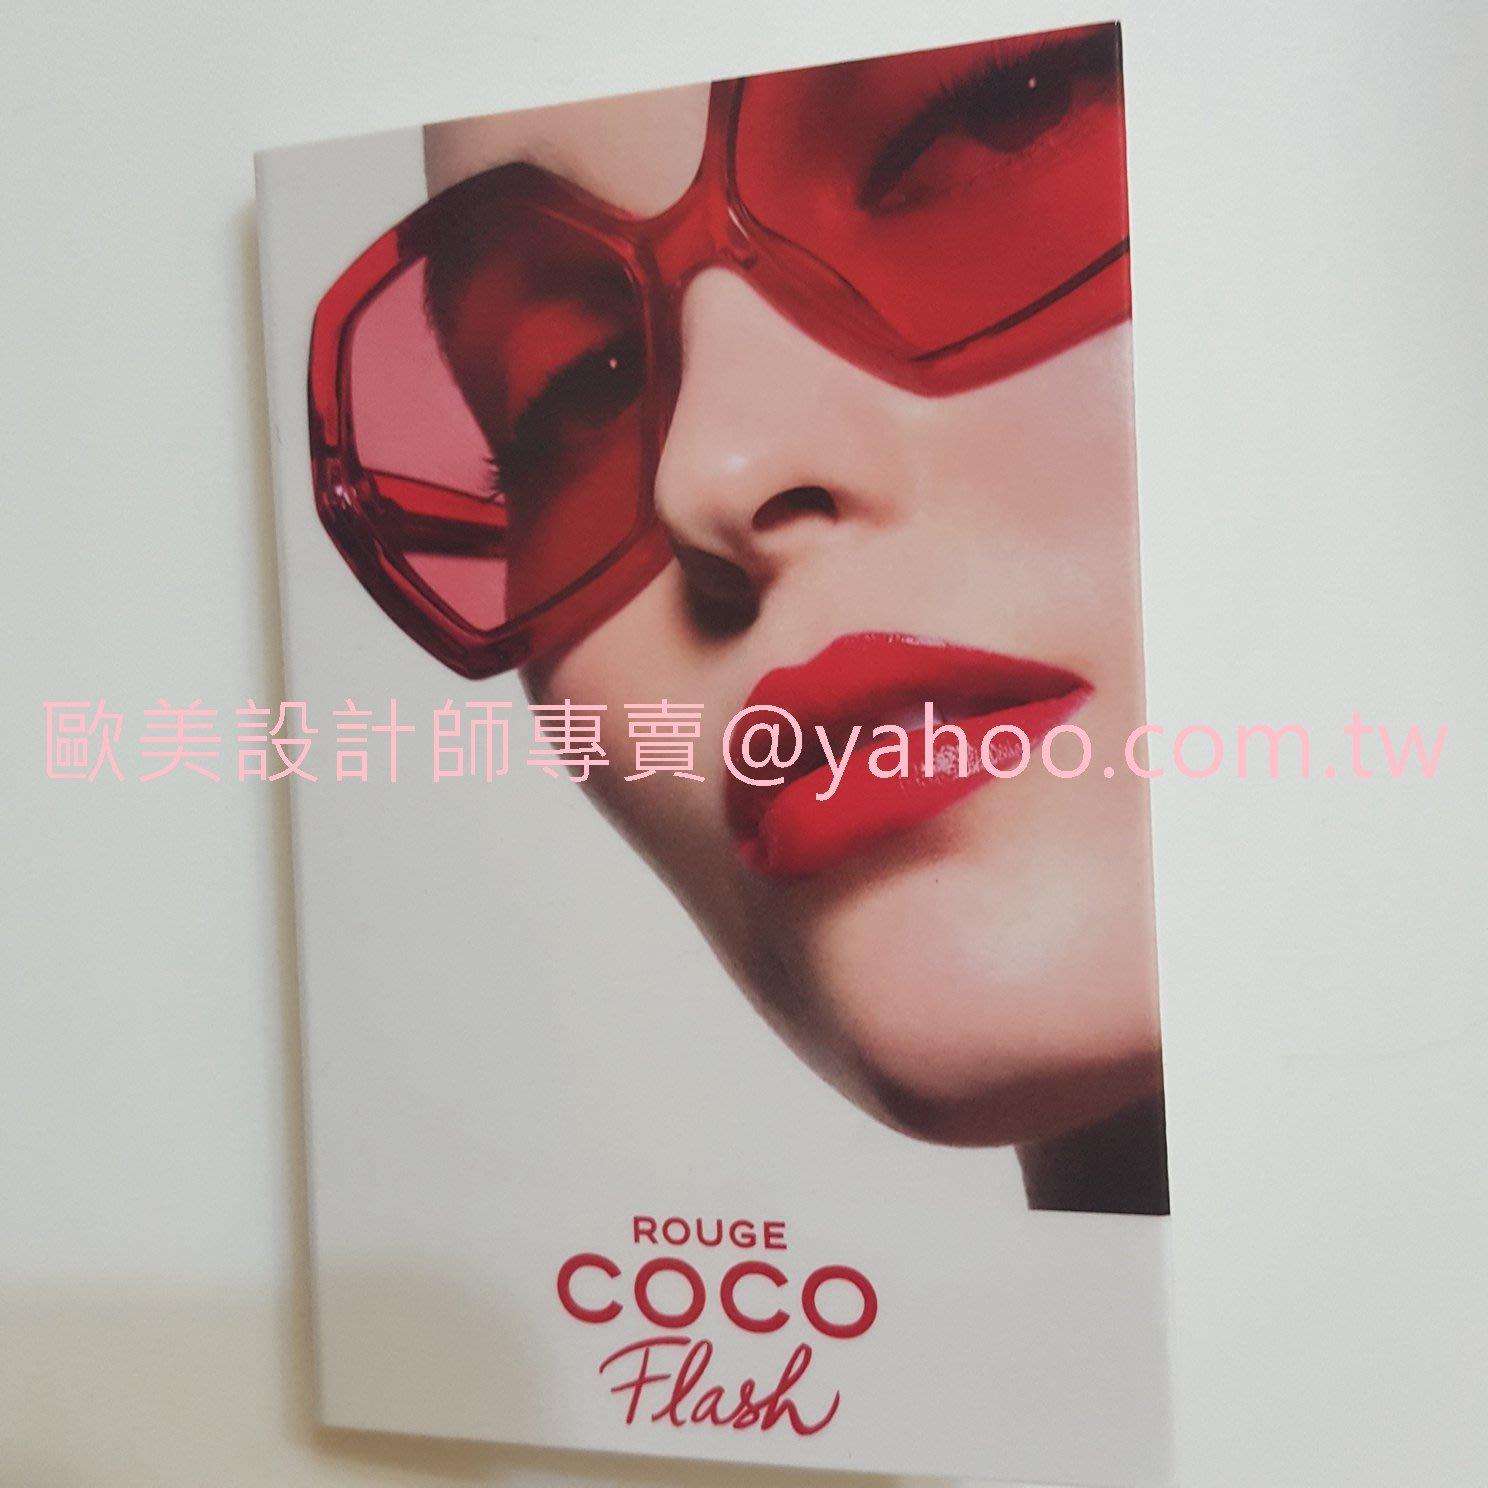 Chanel 香奈兒 Coco 晶亮水唇膏 54 BOY 0.75g 期限 2021.09